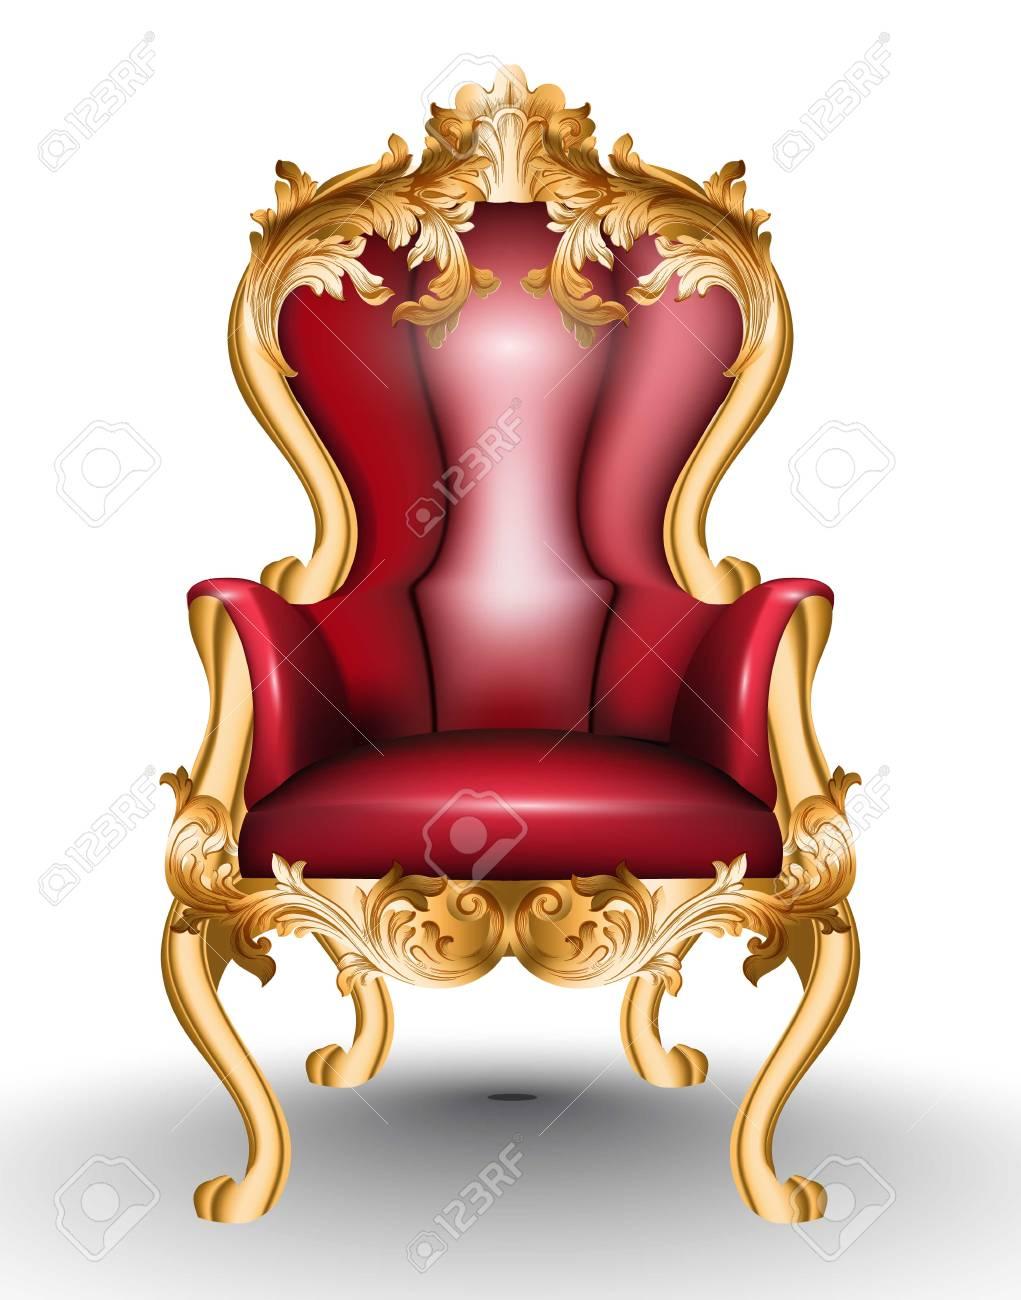 Sillón Glamoroso Rojo Barroco Aislado Sobre Fondo Blanco. Muebles ...